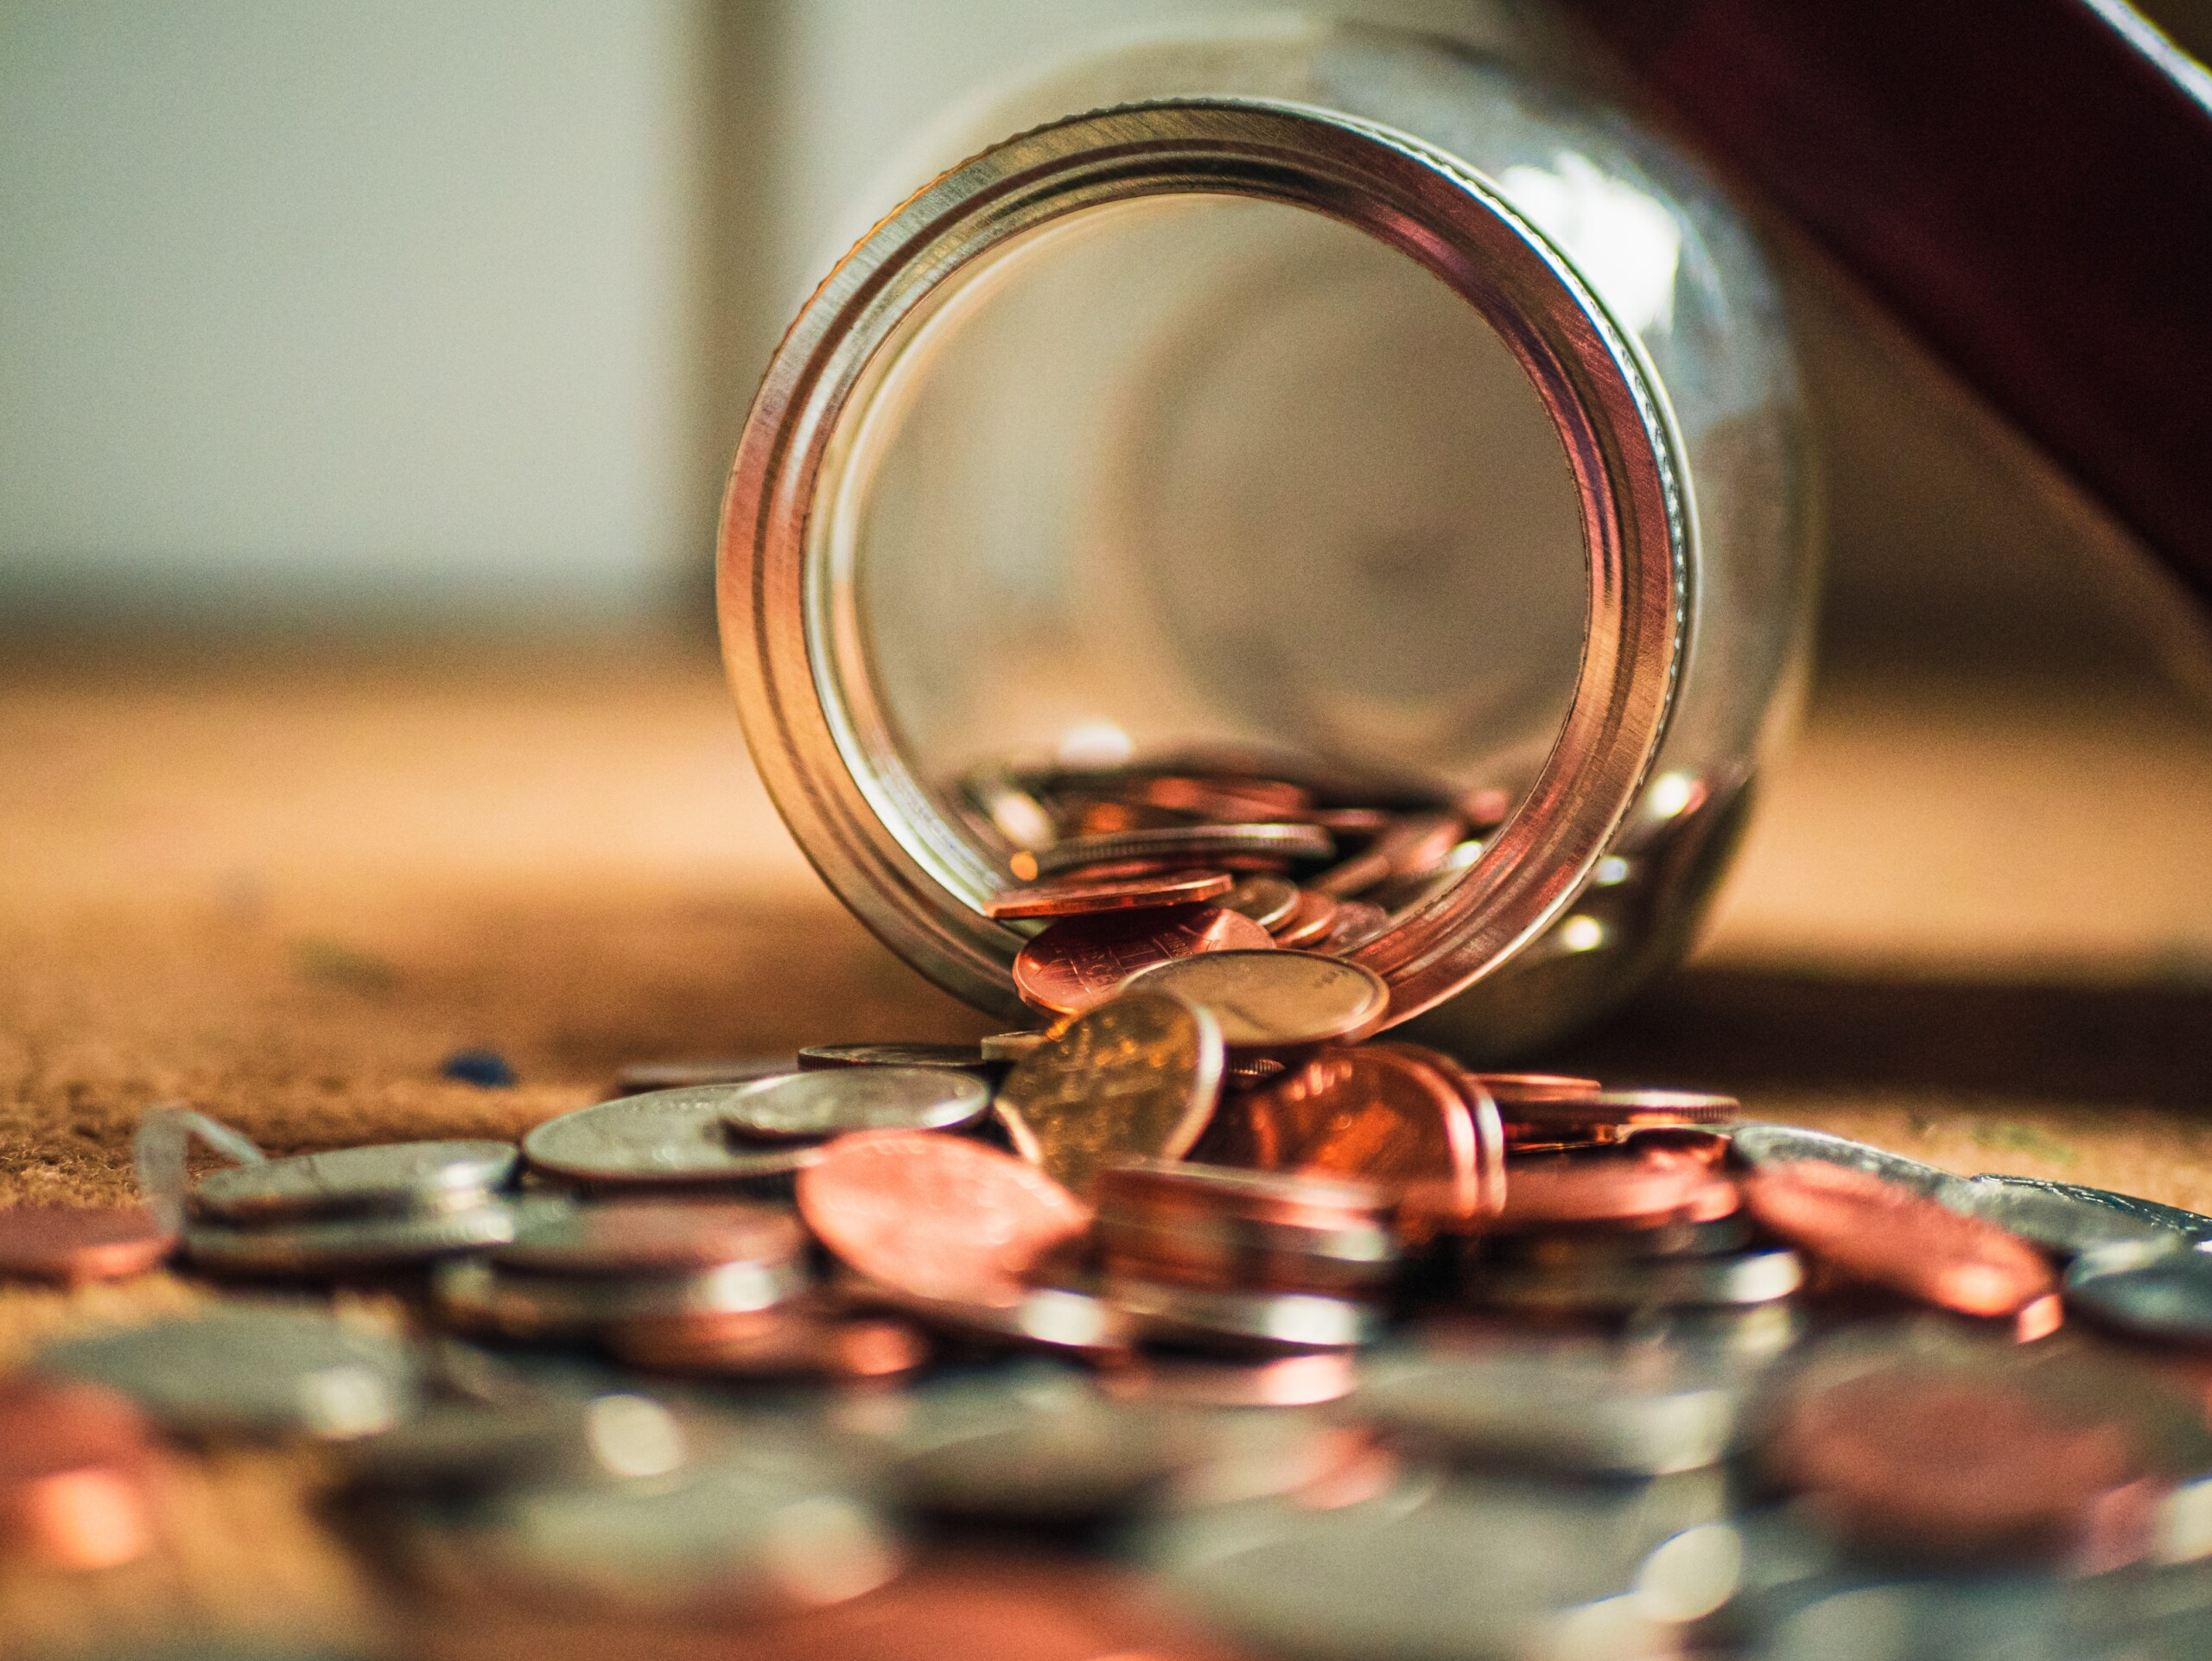 Raccolta fondi nelle associazioni